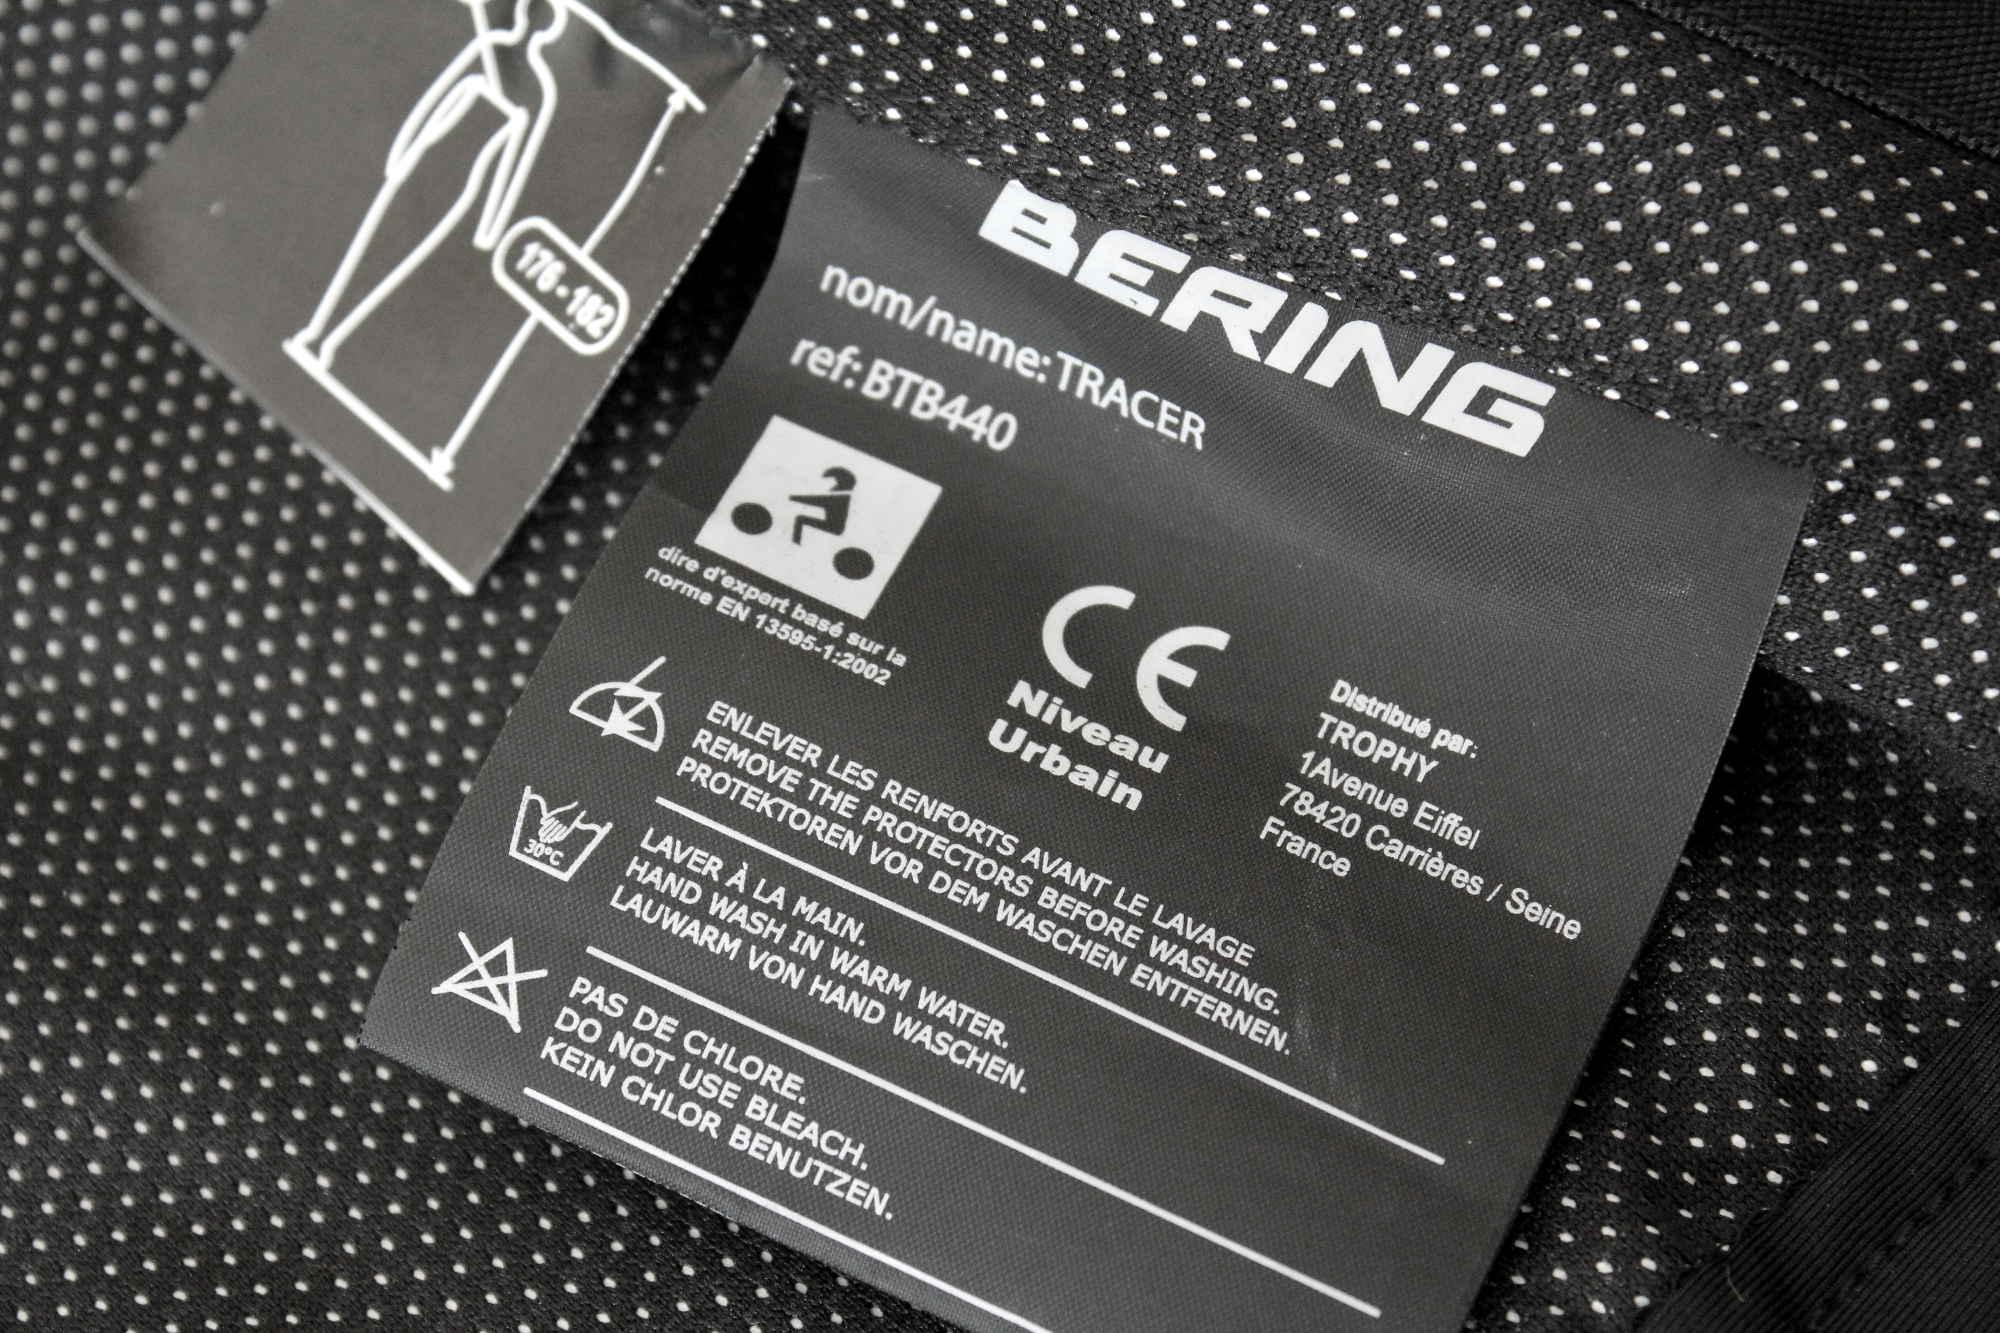 Etiquettes Bering Tracer